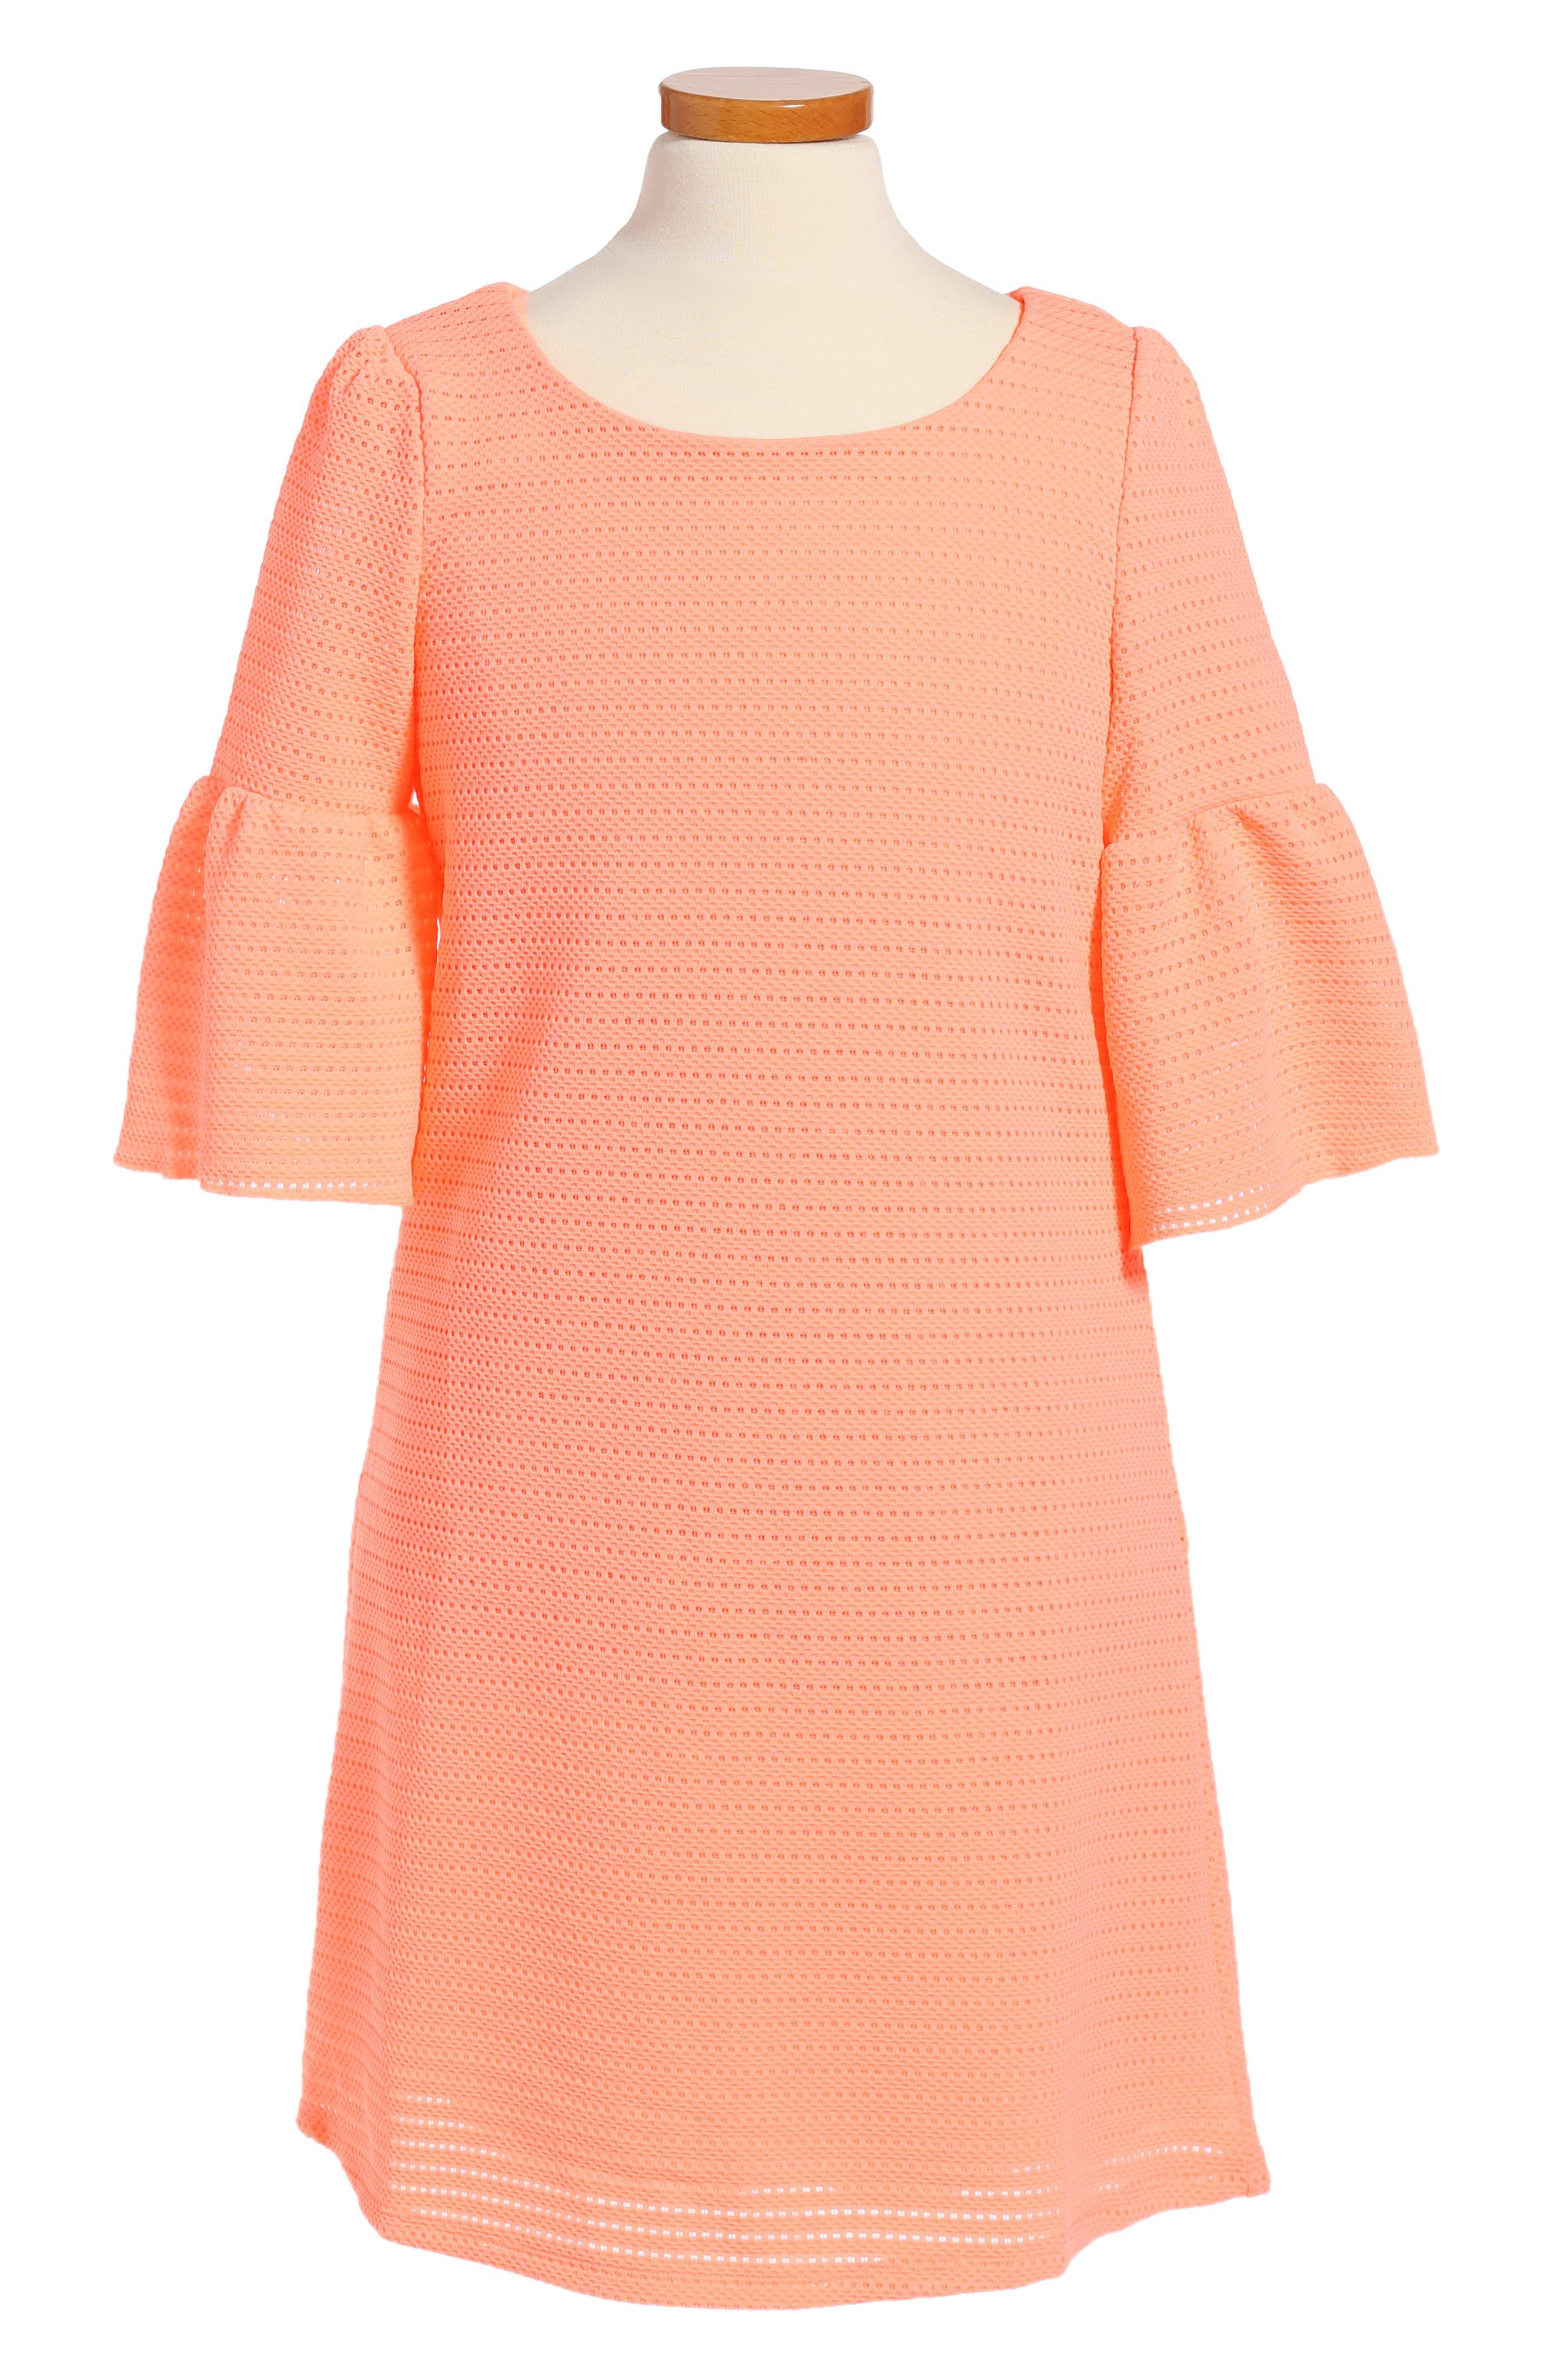 Main Image - Love, Nickie Lew Bell Sleeve Dress (Big Girls)